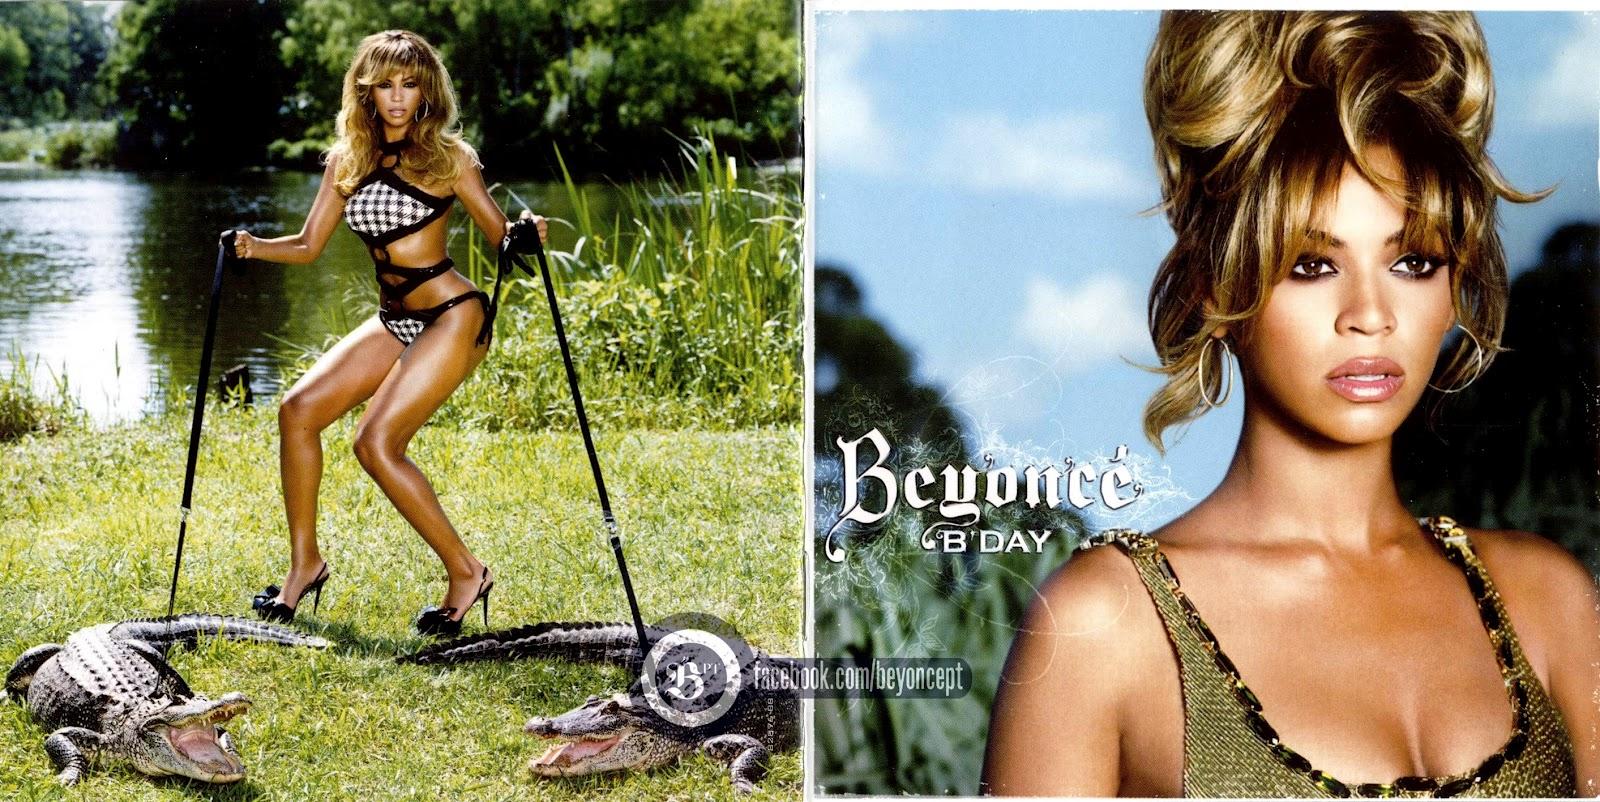 [ALBUM] B'Day (Standard Edition) ~ Beyoncé Encartes